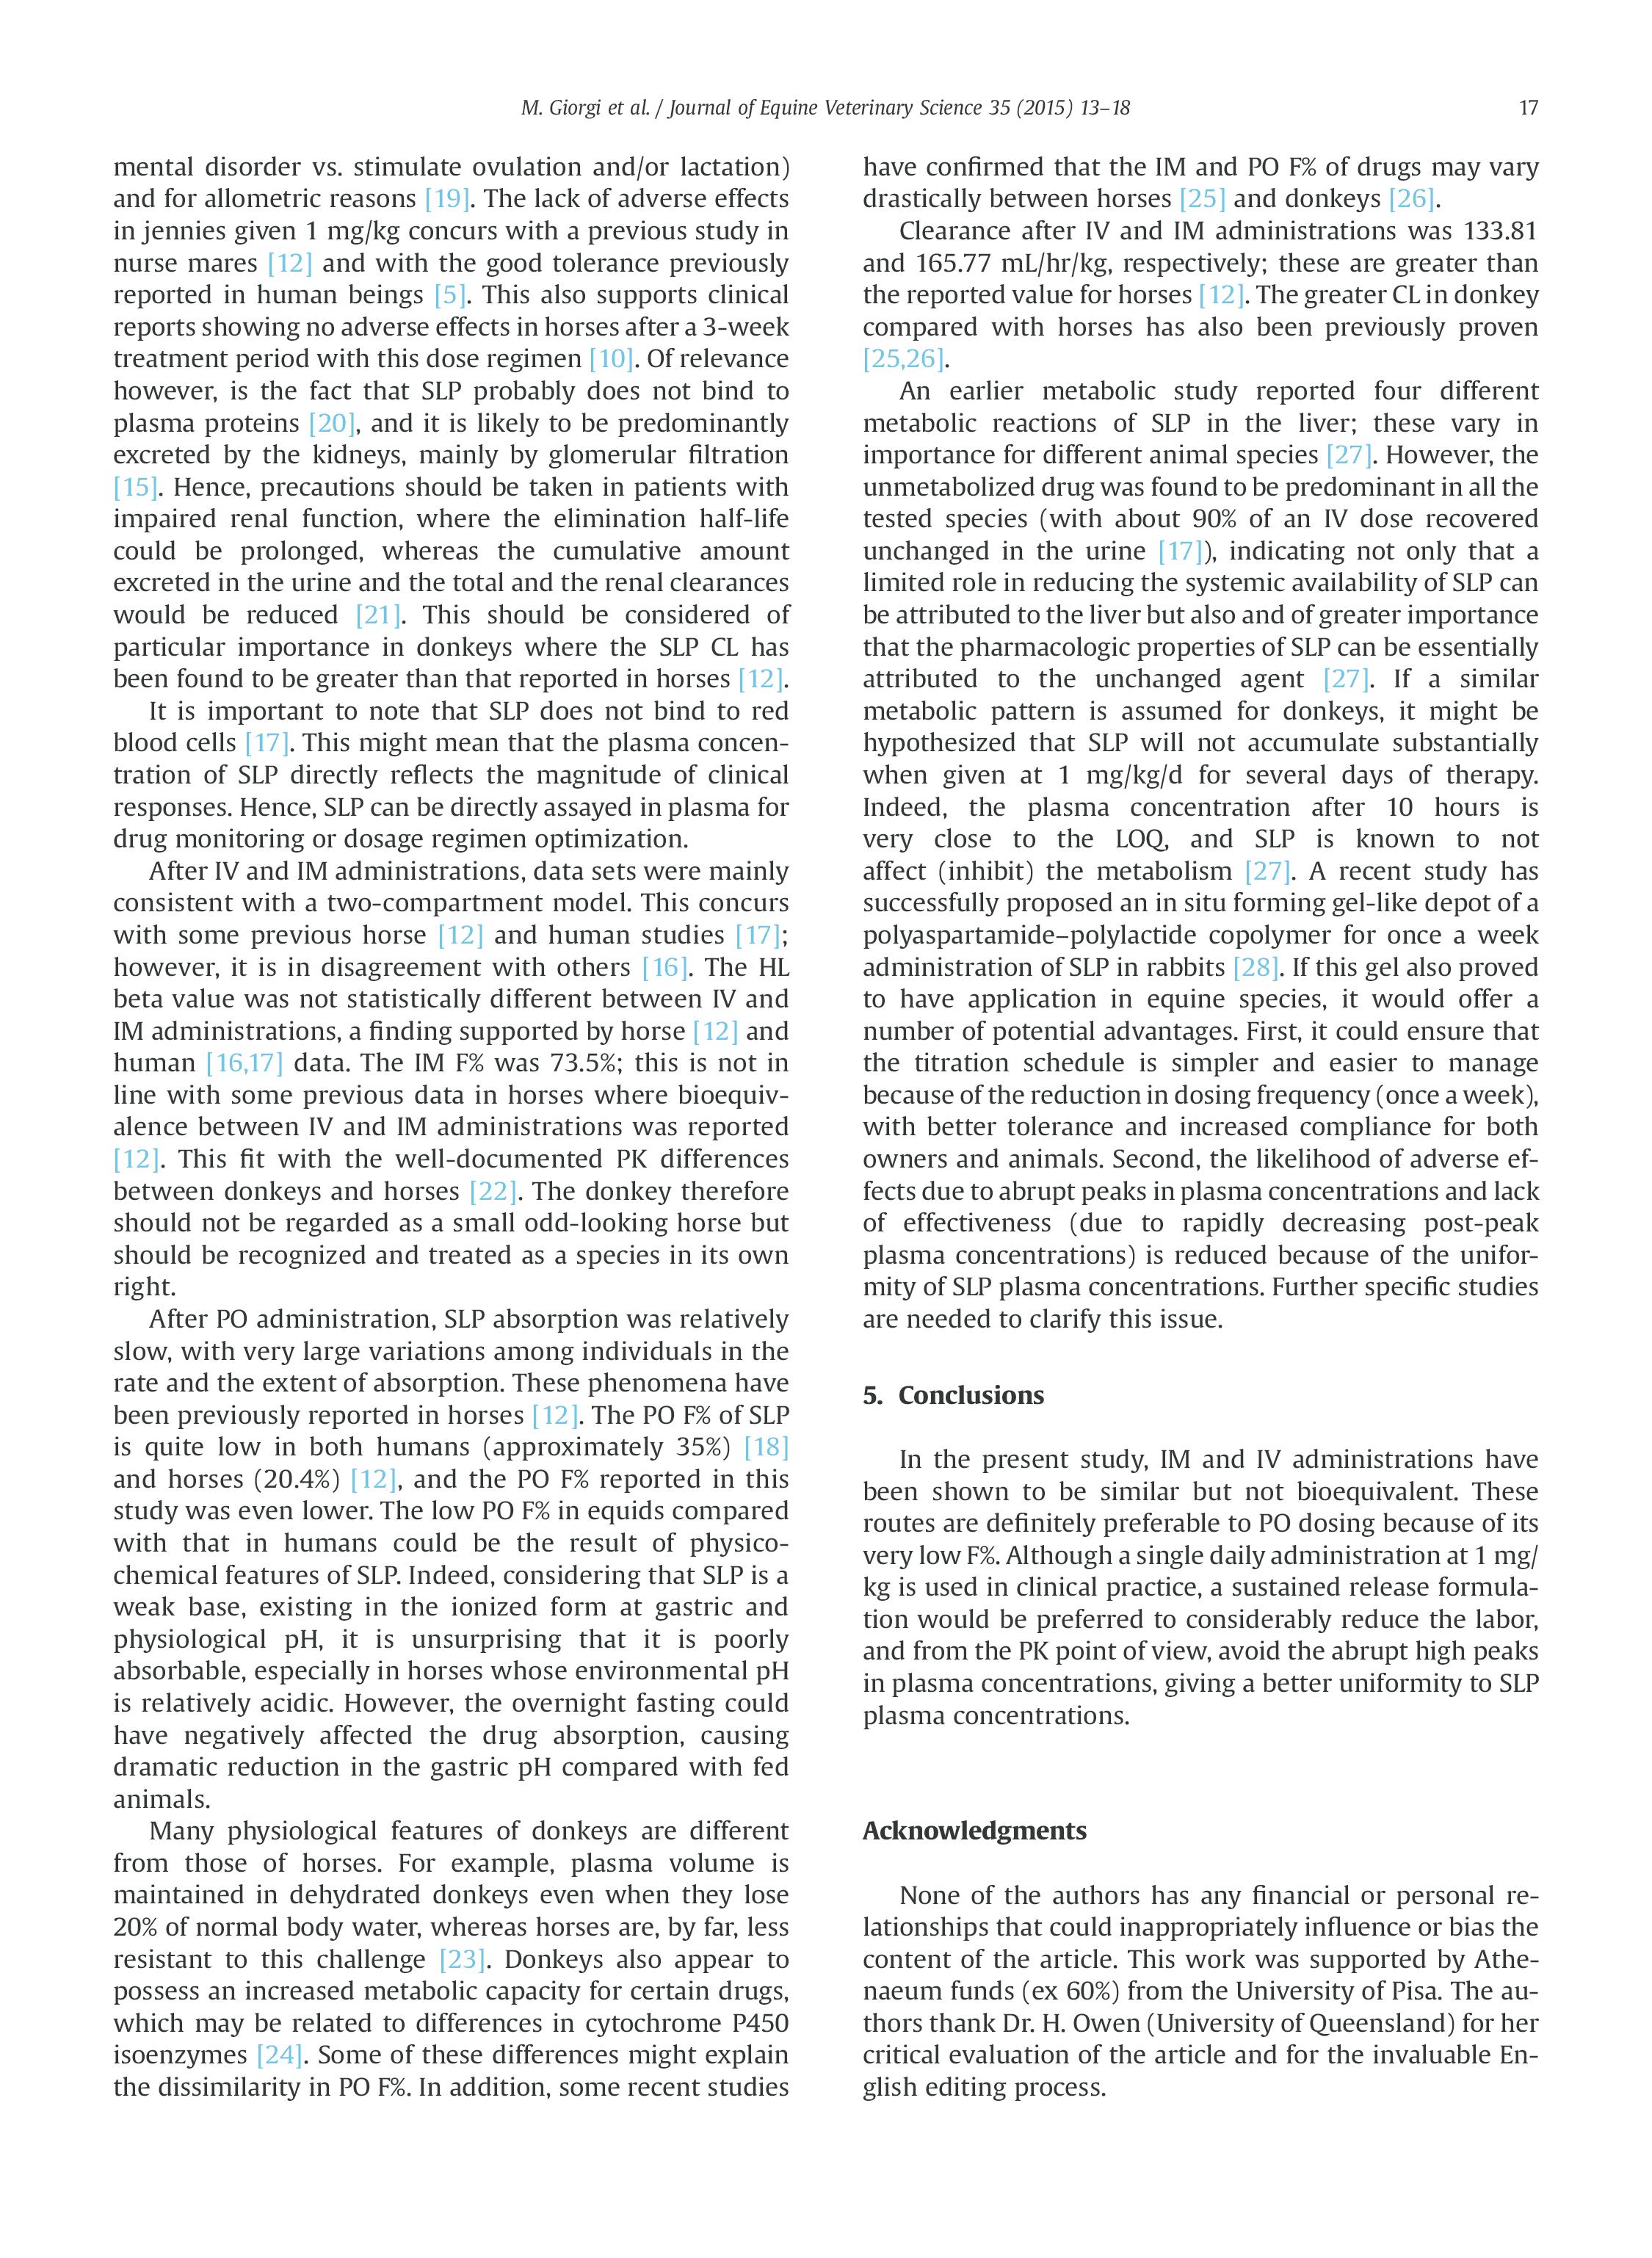 pharmacokinetic_jenniesrepro_ovulation-4.png